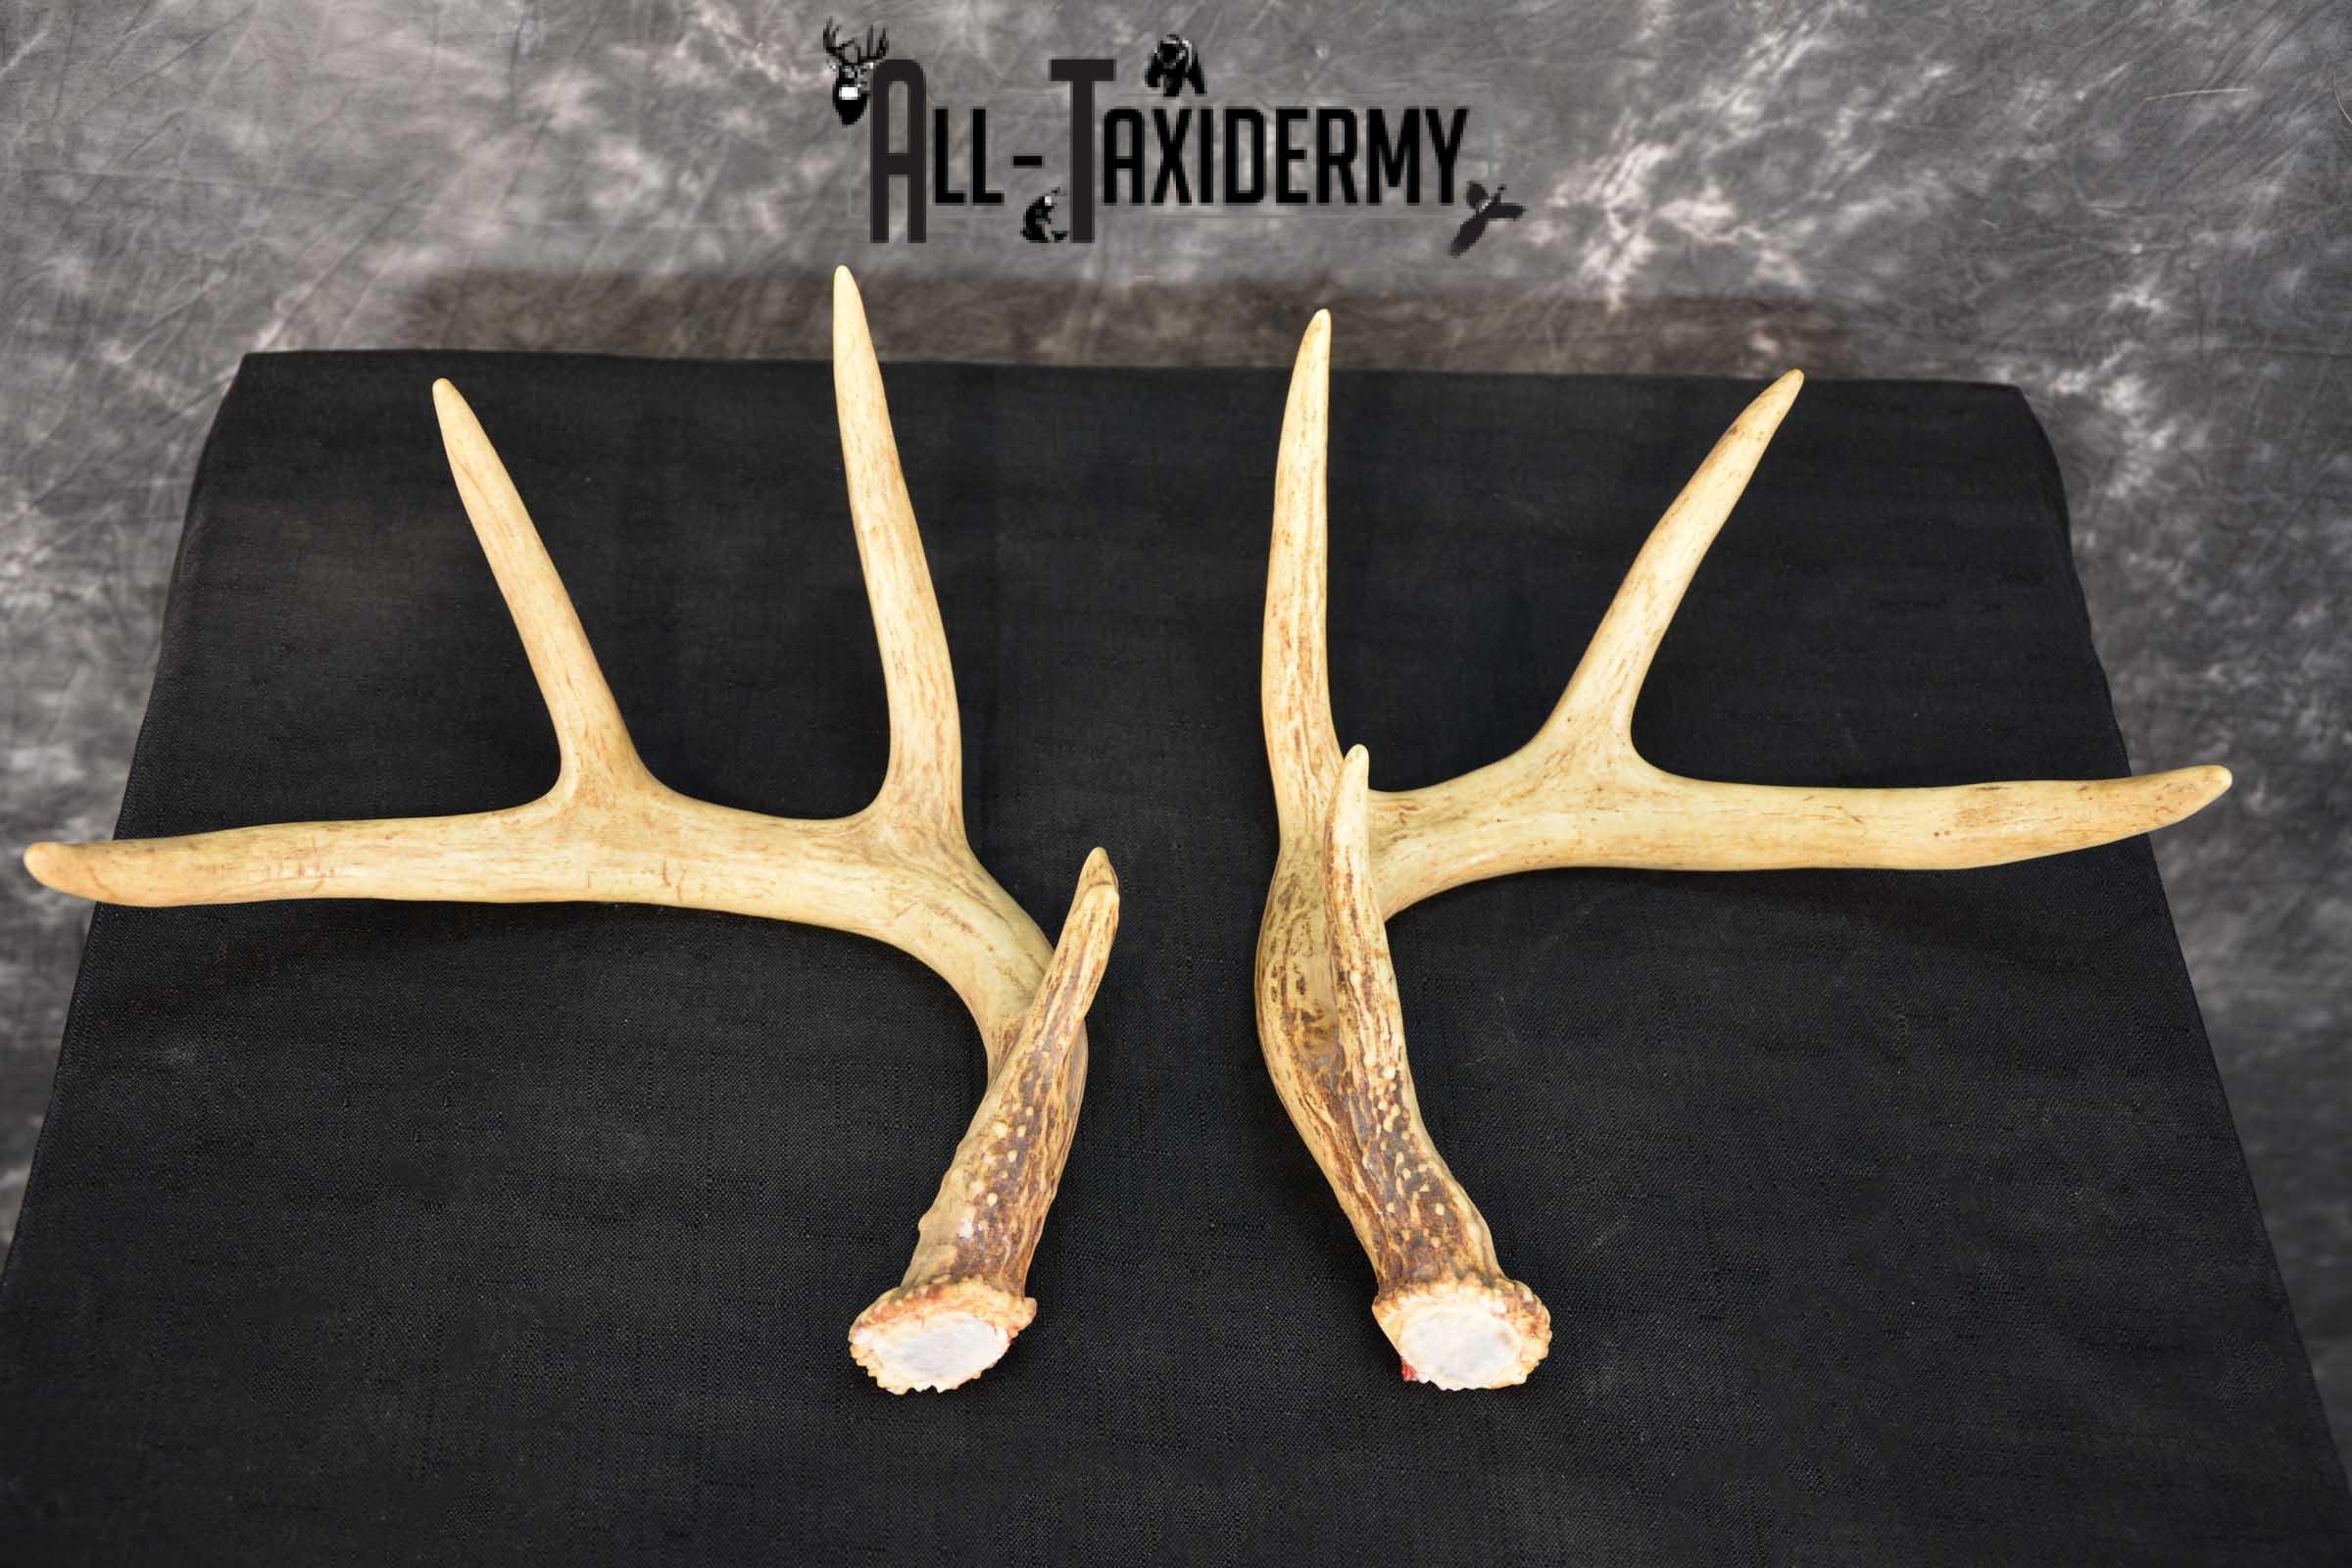 Whitetail Deer Antler Taxidermy Cut offs SKU 1555.2